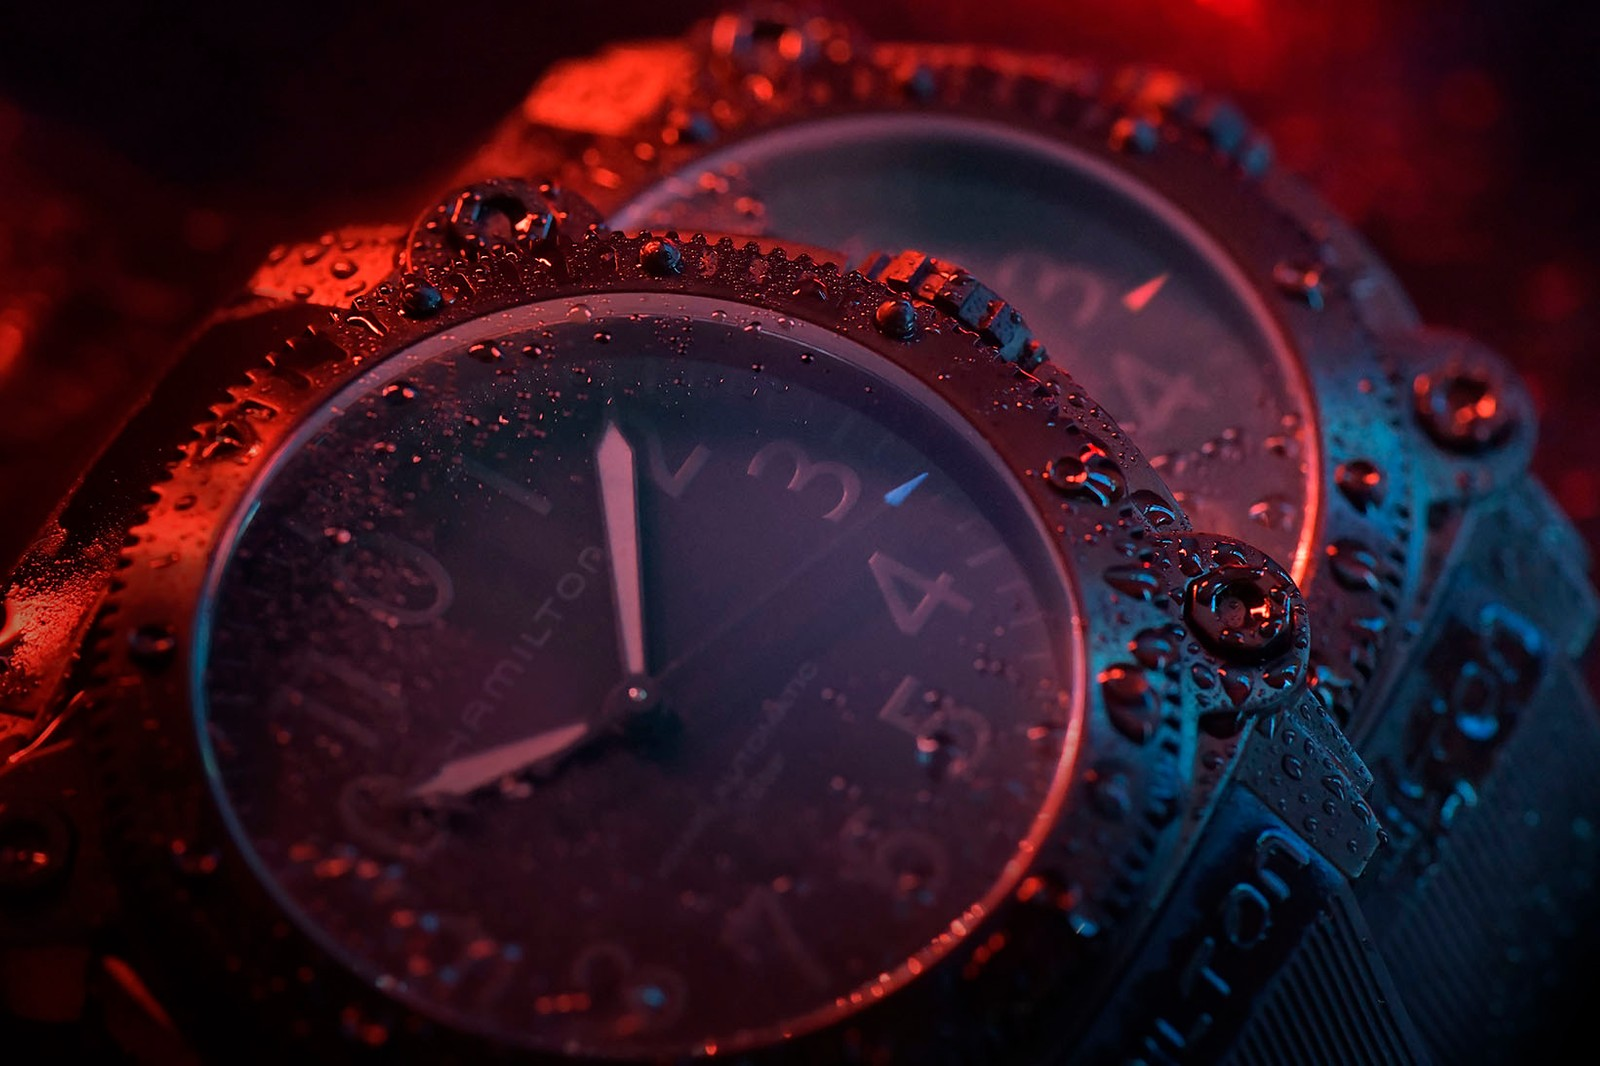 Hamilton BeLOWZERO Special Edition TENET Wristwatch Christopher Nolan Robert Pattison